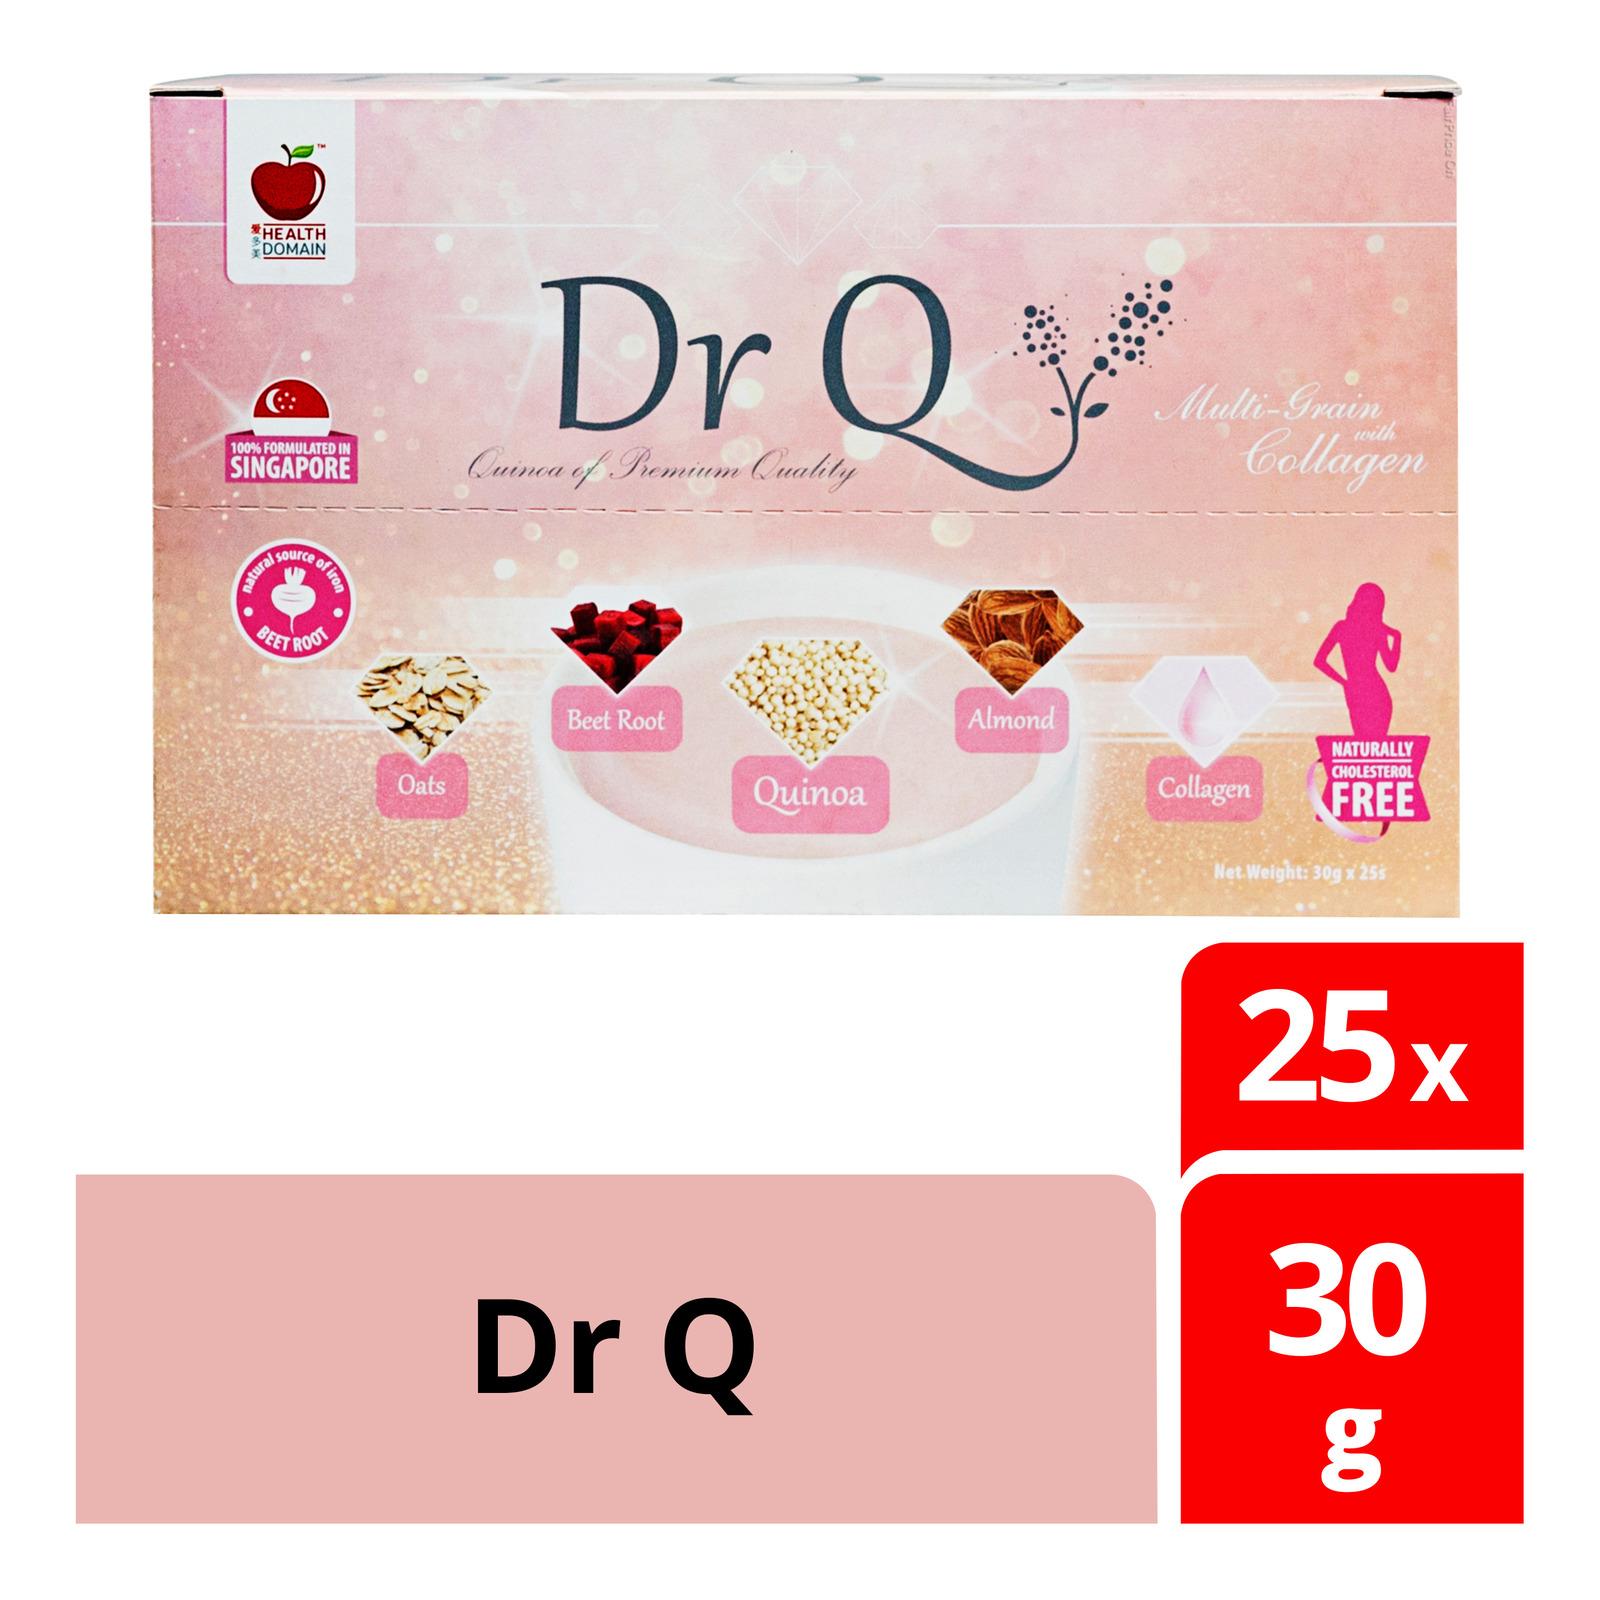 Health Domain Dr Q Multi Grain with Collagen